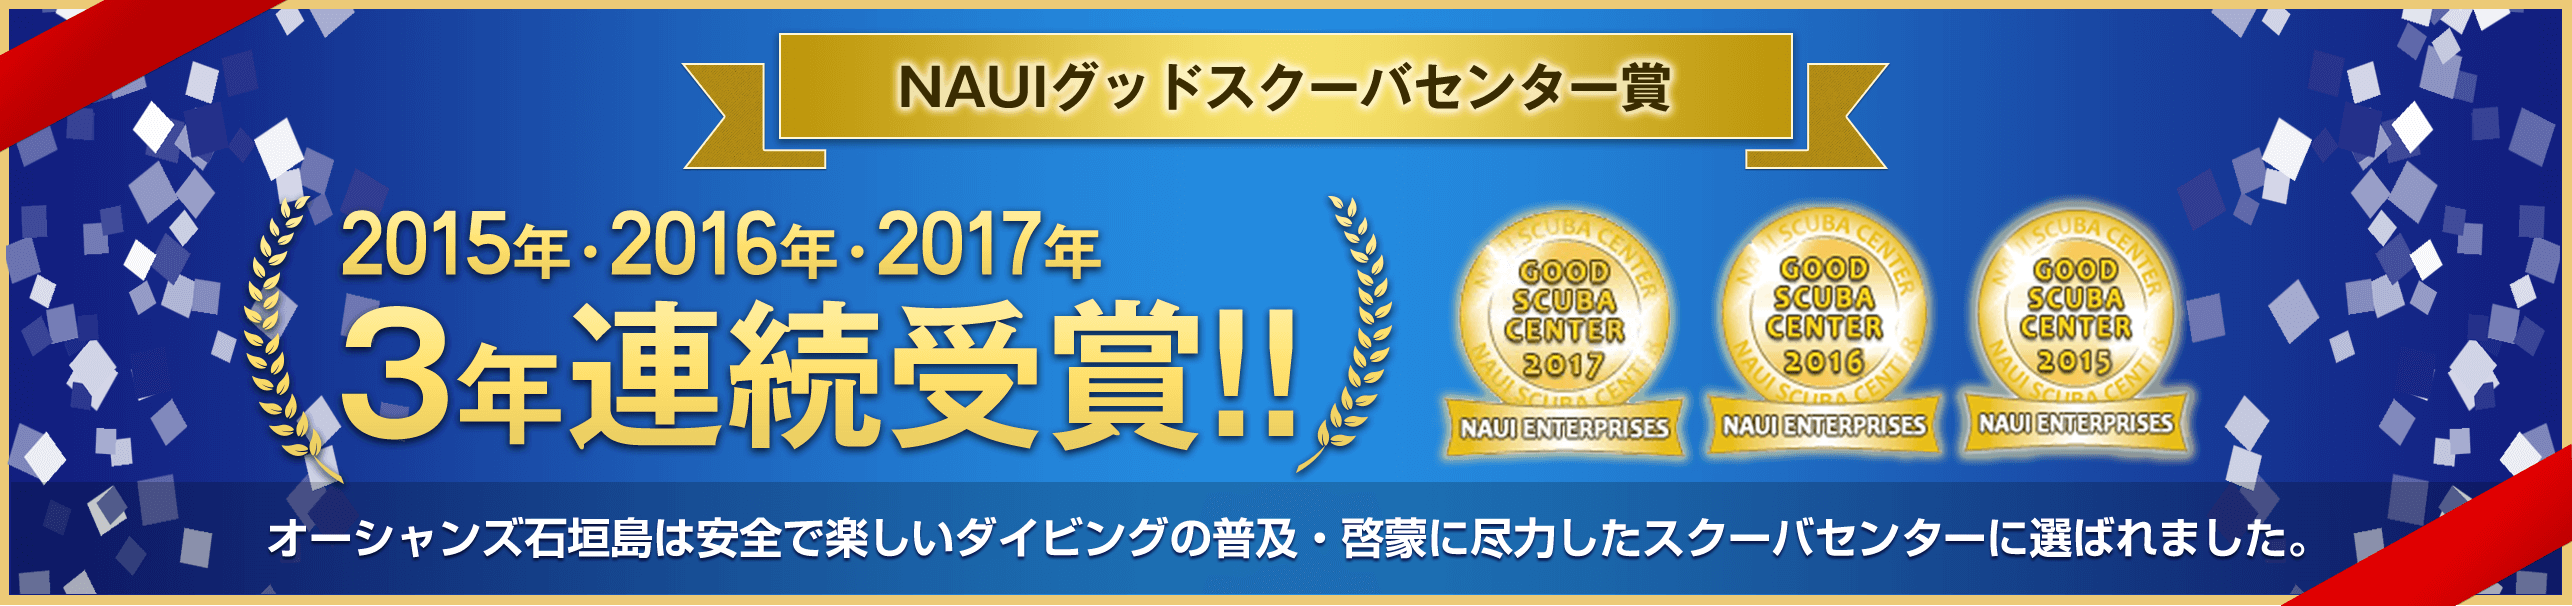 NAUIグッドスクーバセンター賞 2017&2016&2015受賞!!